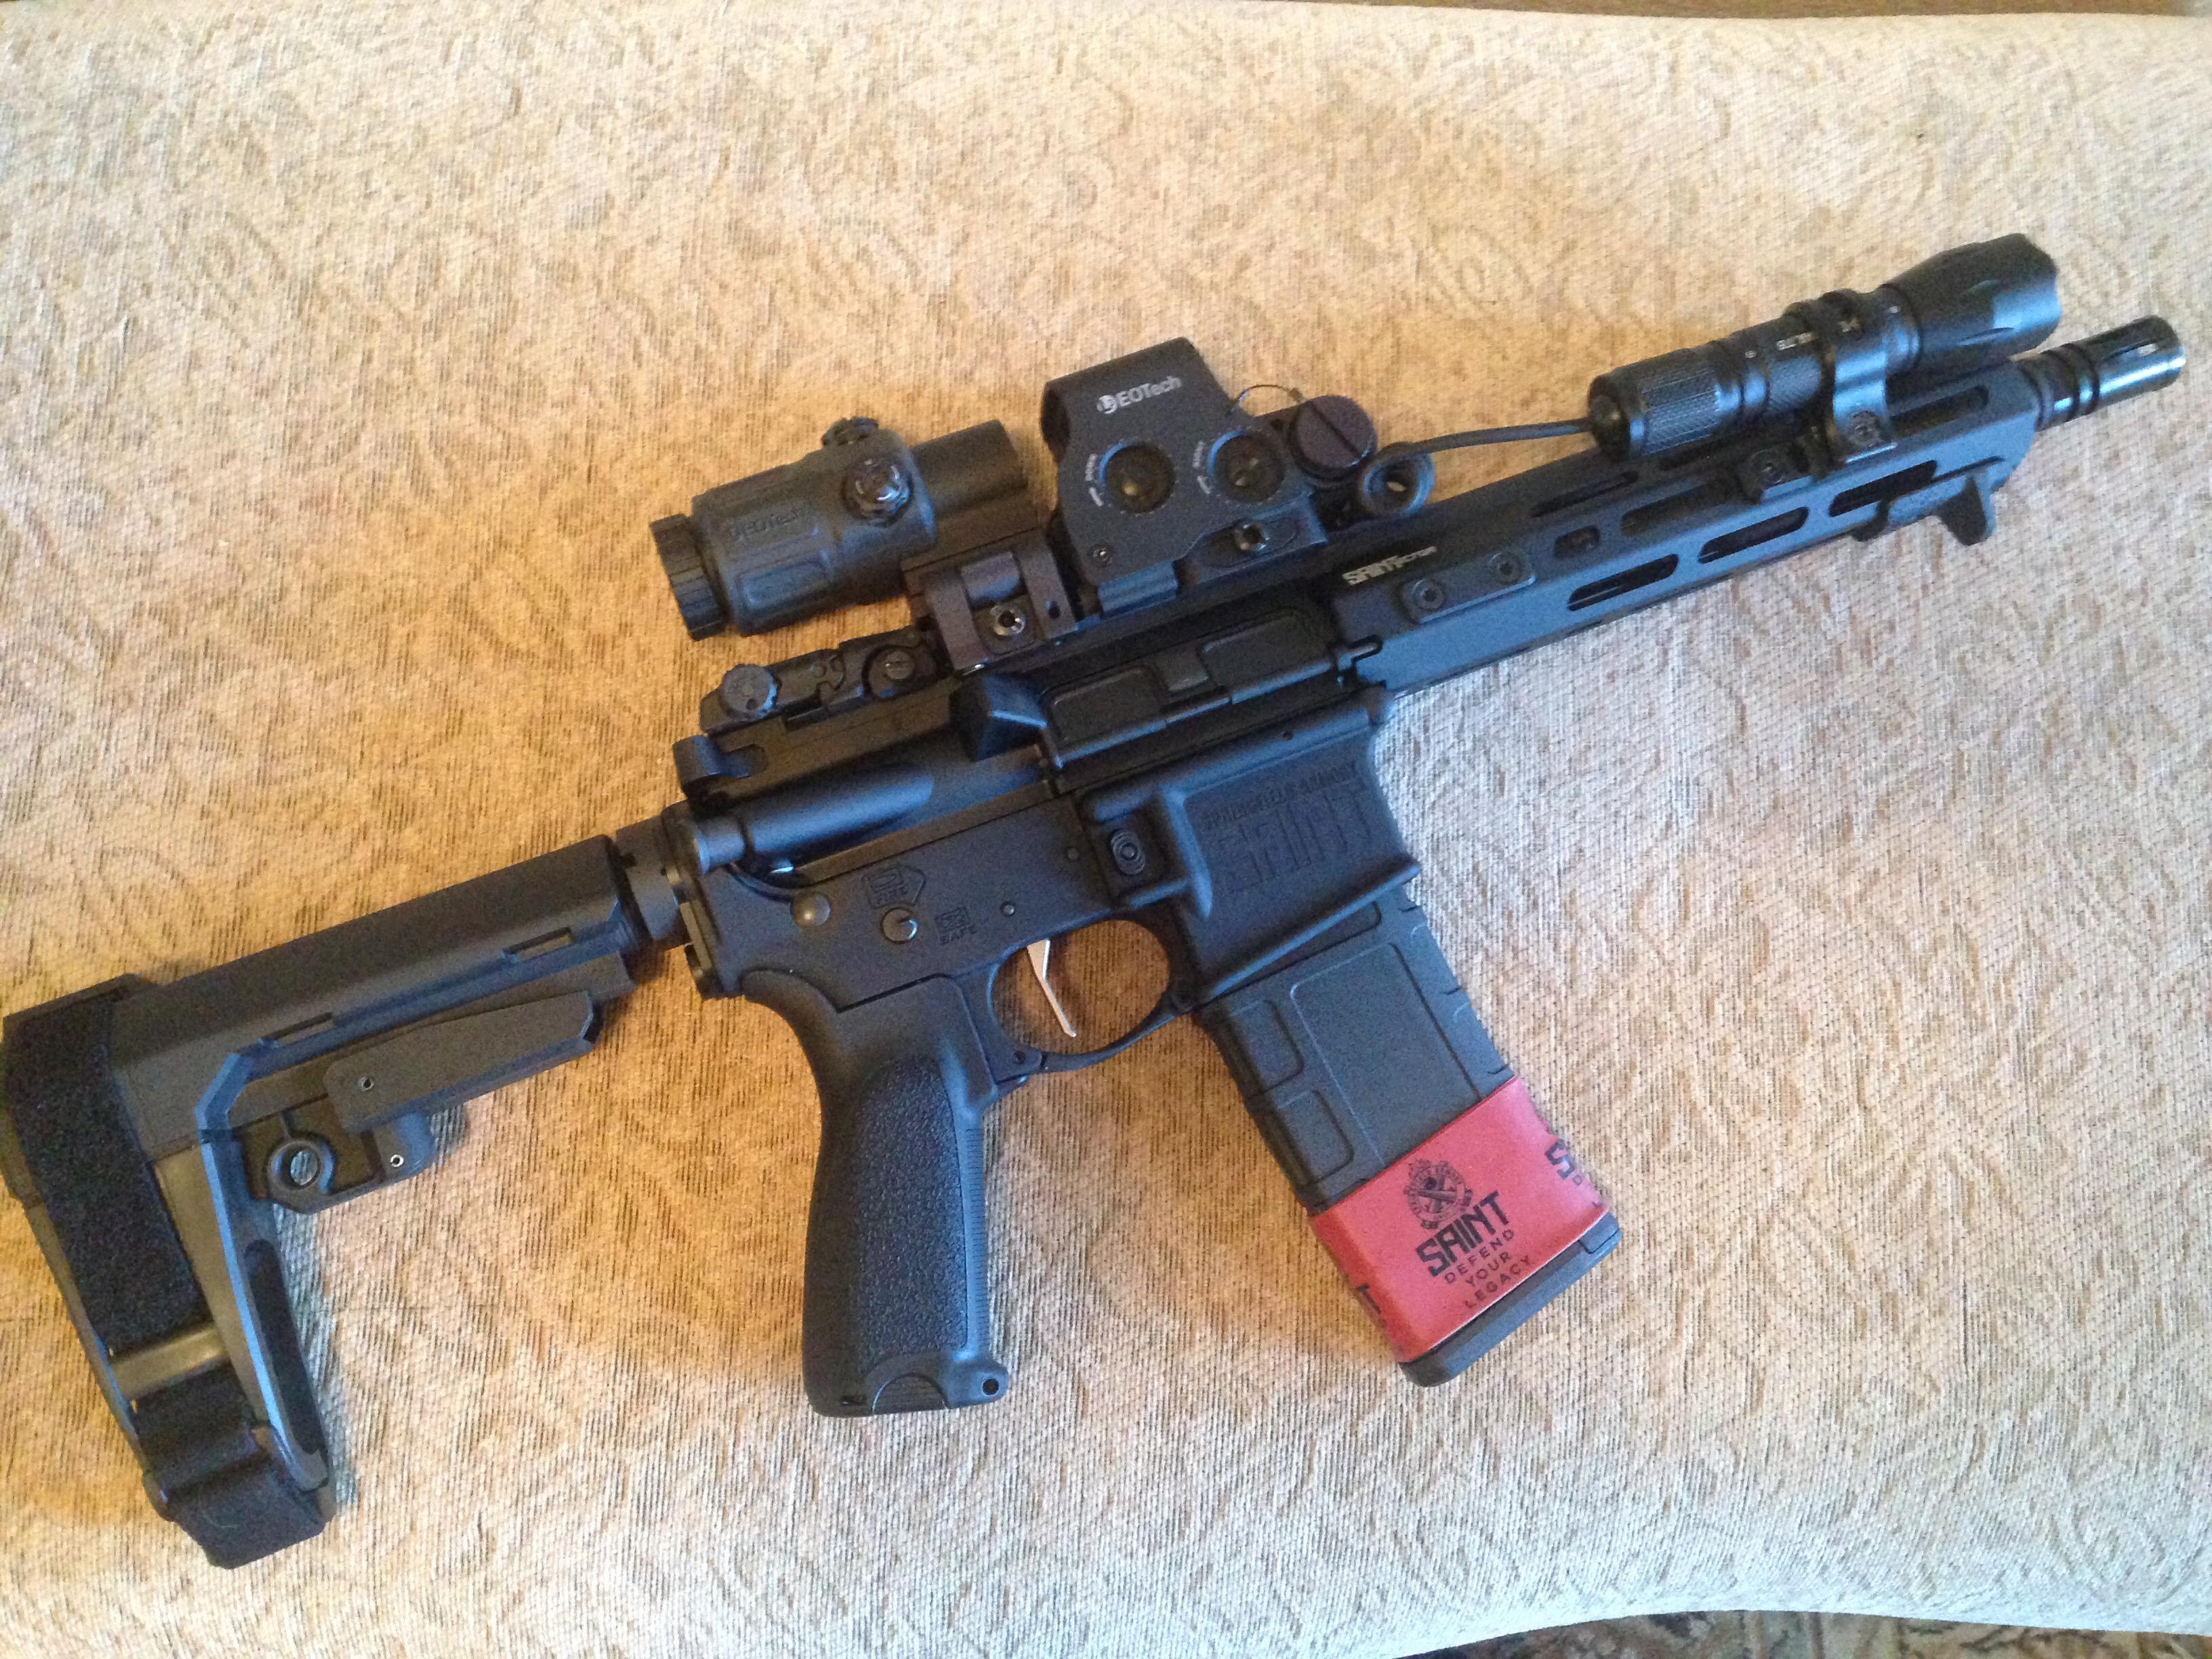 Rifle Picture Thread-img_2951_1601337202978.jpg